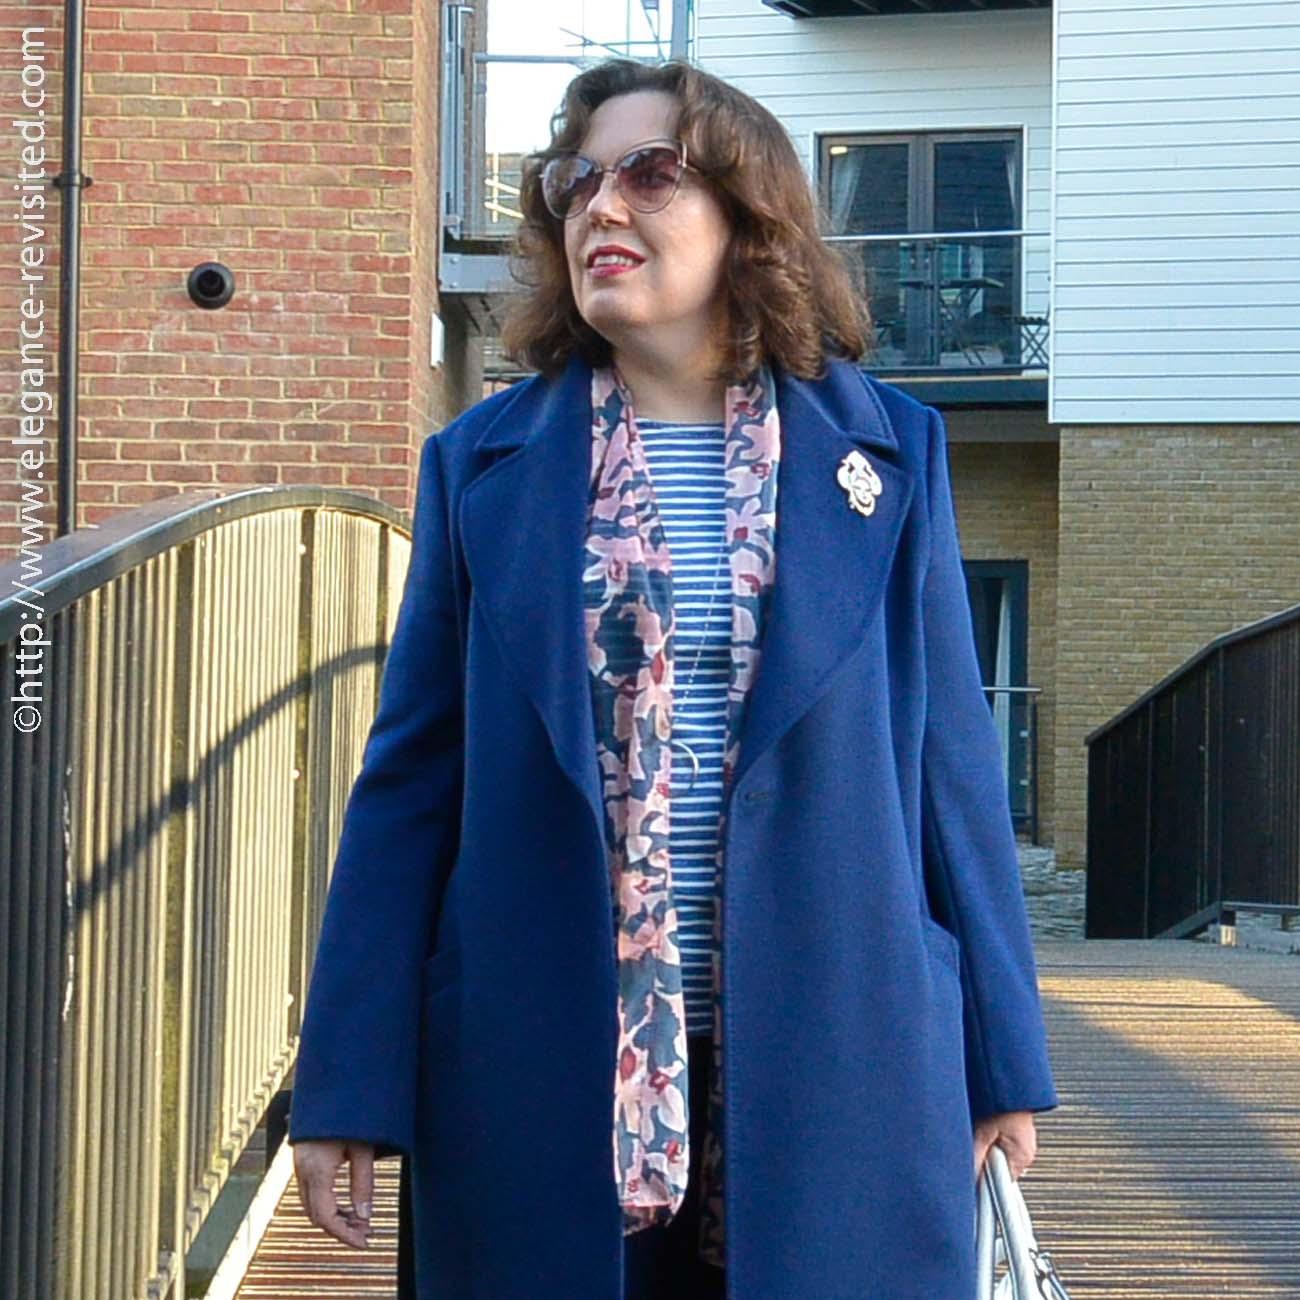 wraparound coat